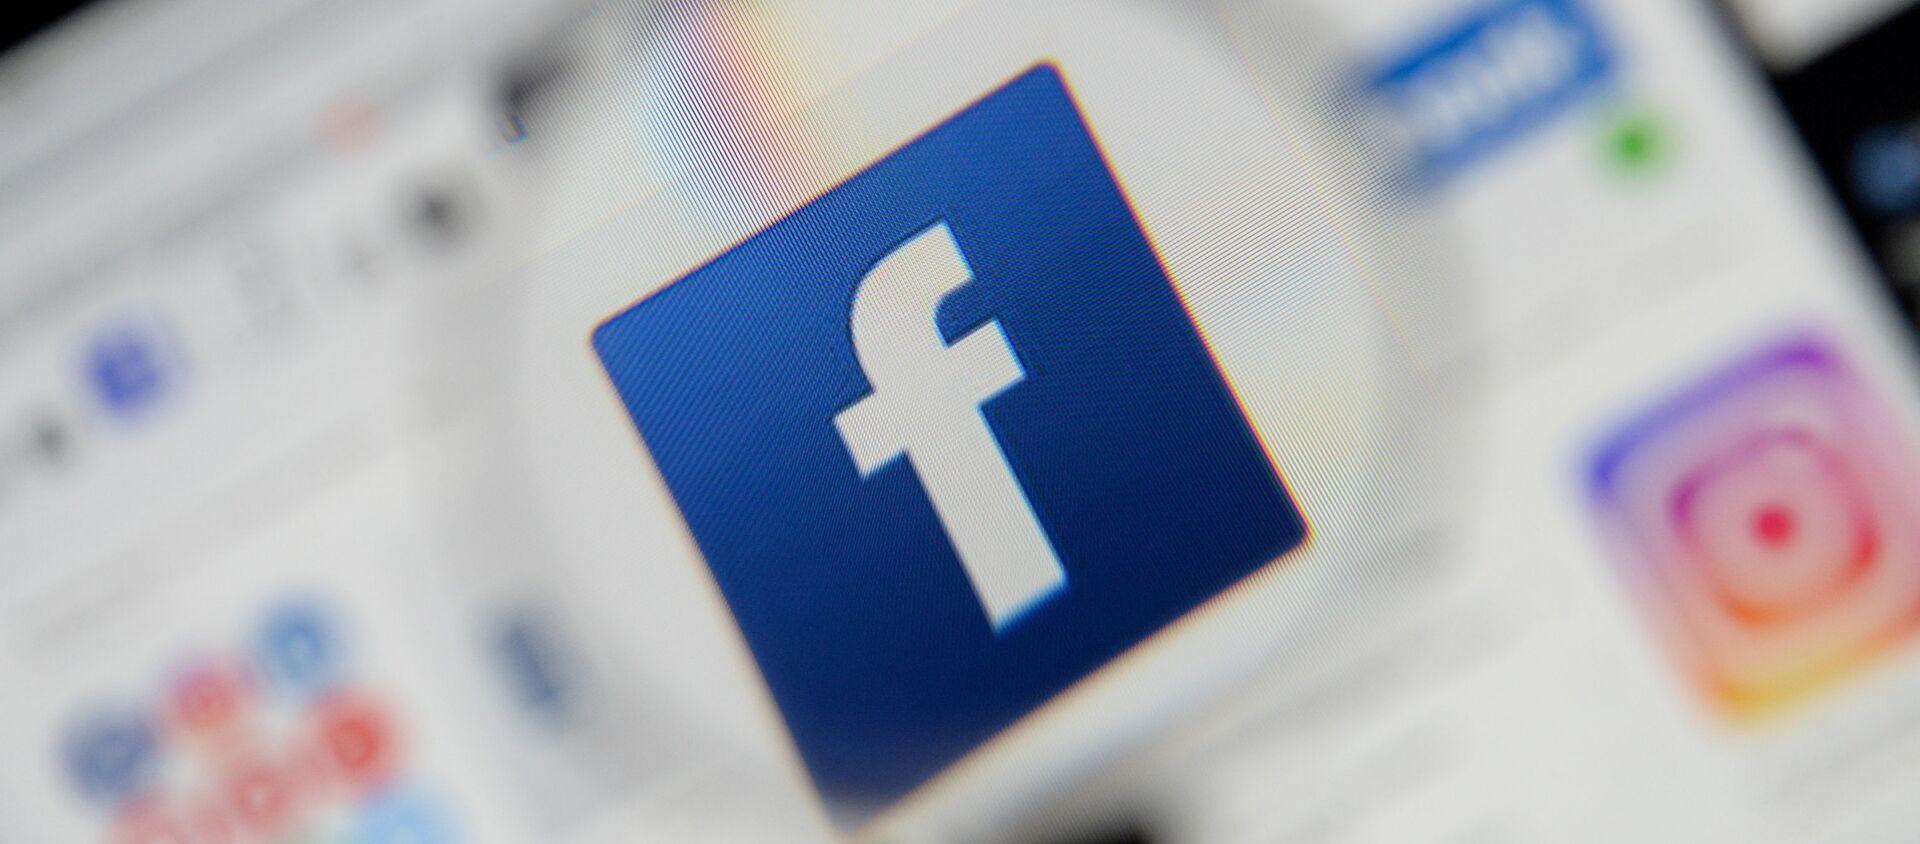 The Facebook logo is seen on a screen in this picture illustration taken December 2, 2019. - Sputnik International, 1920, 17.07.2021